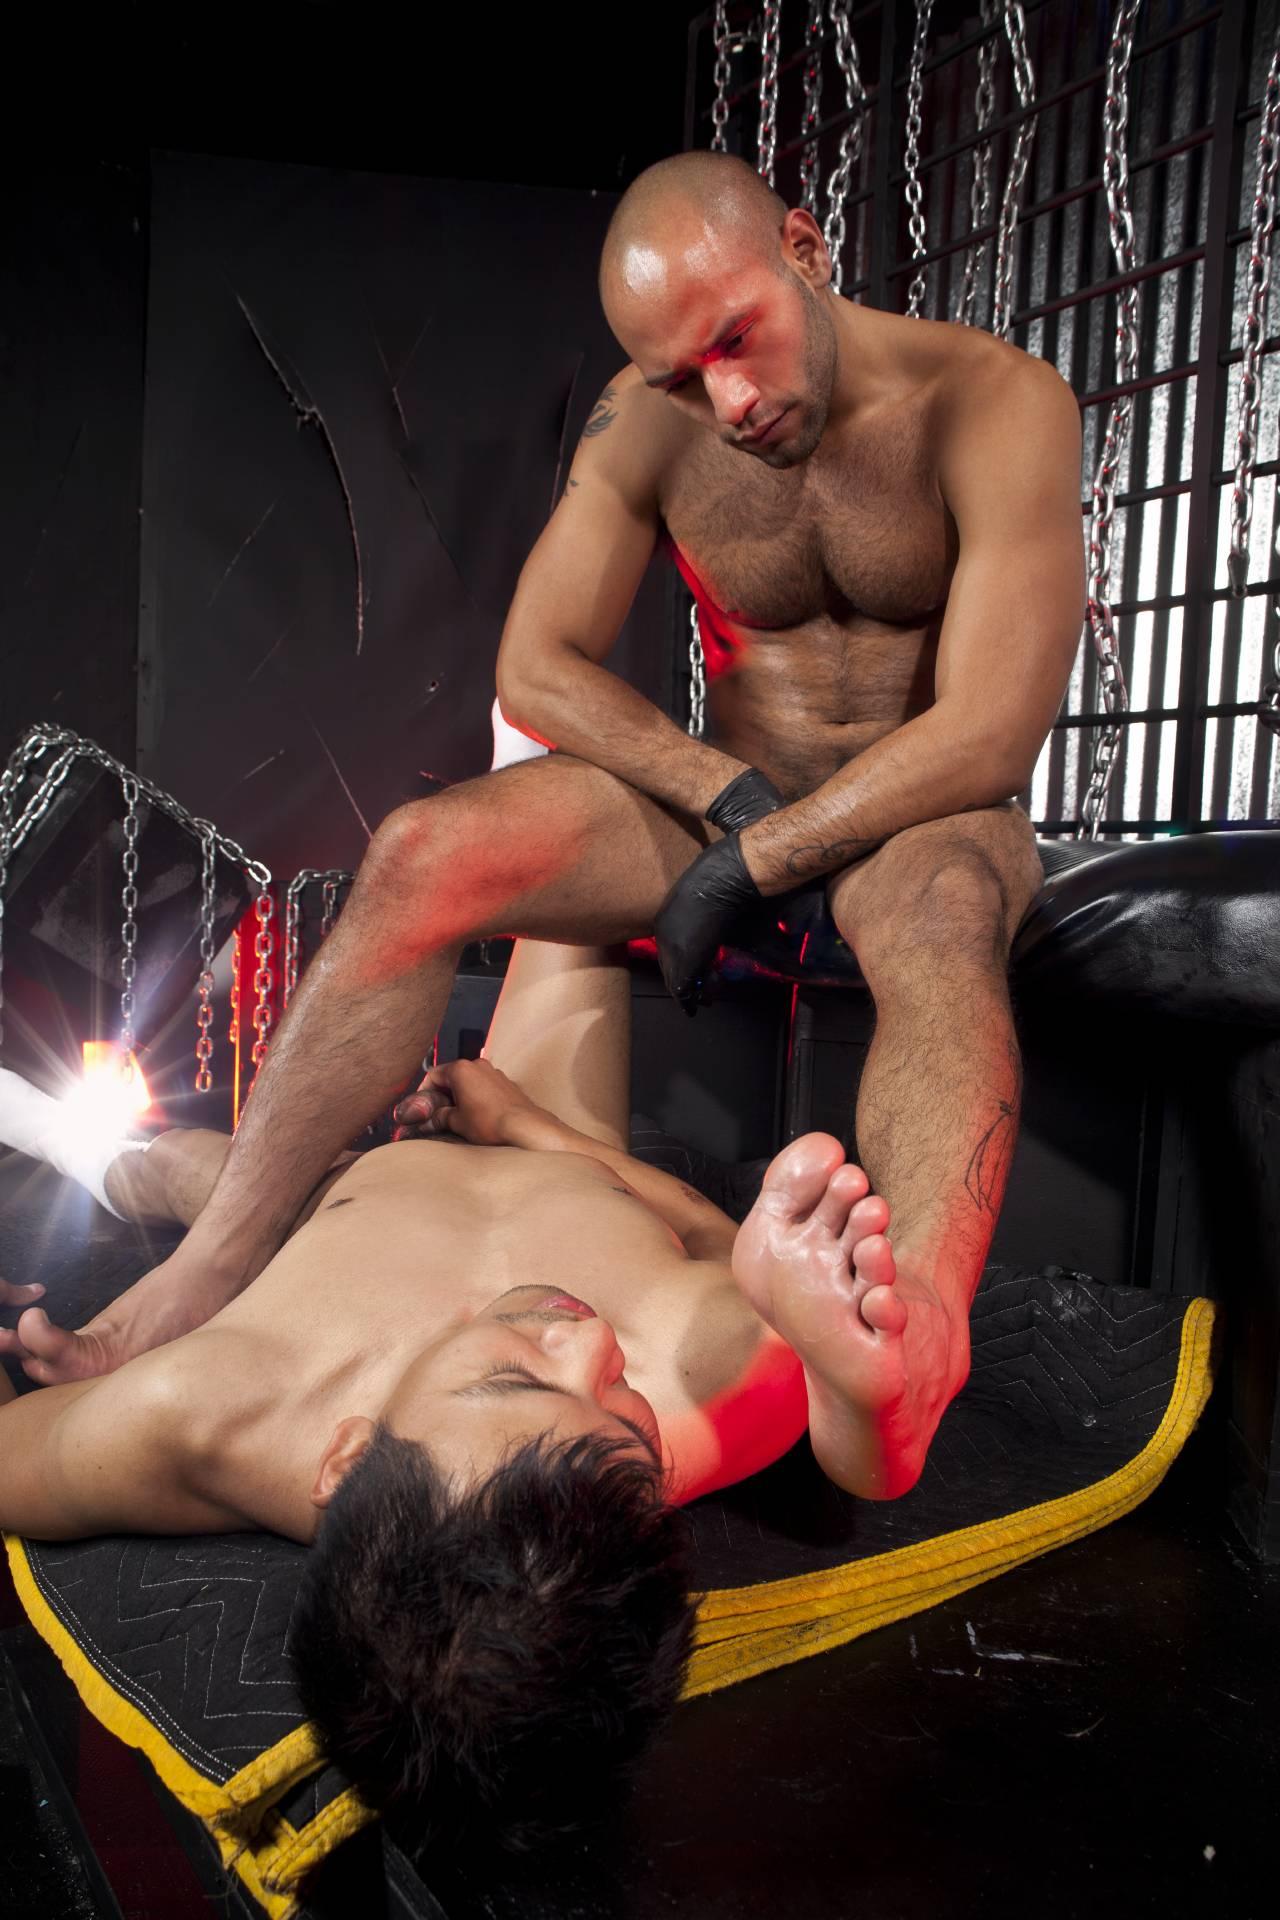 Free gay sleazy fetish porn — pic 4